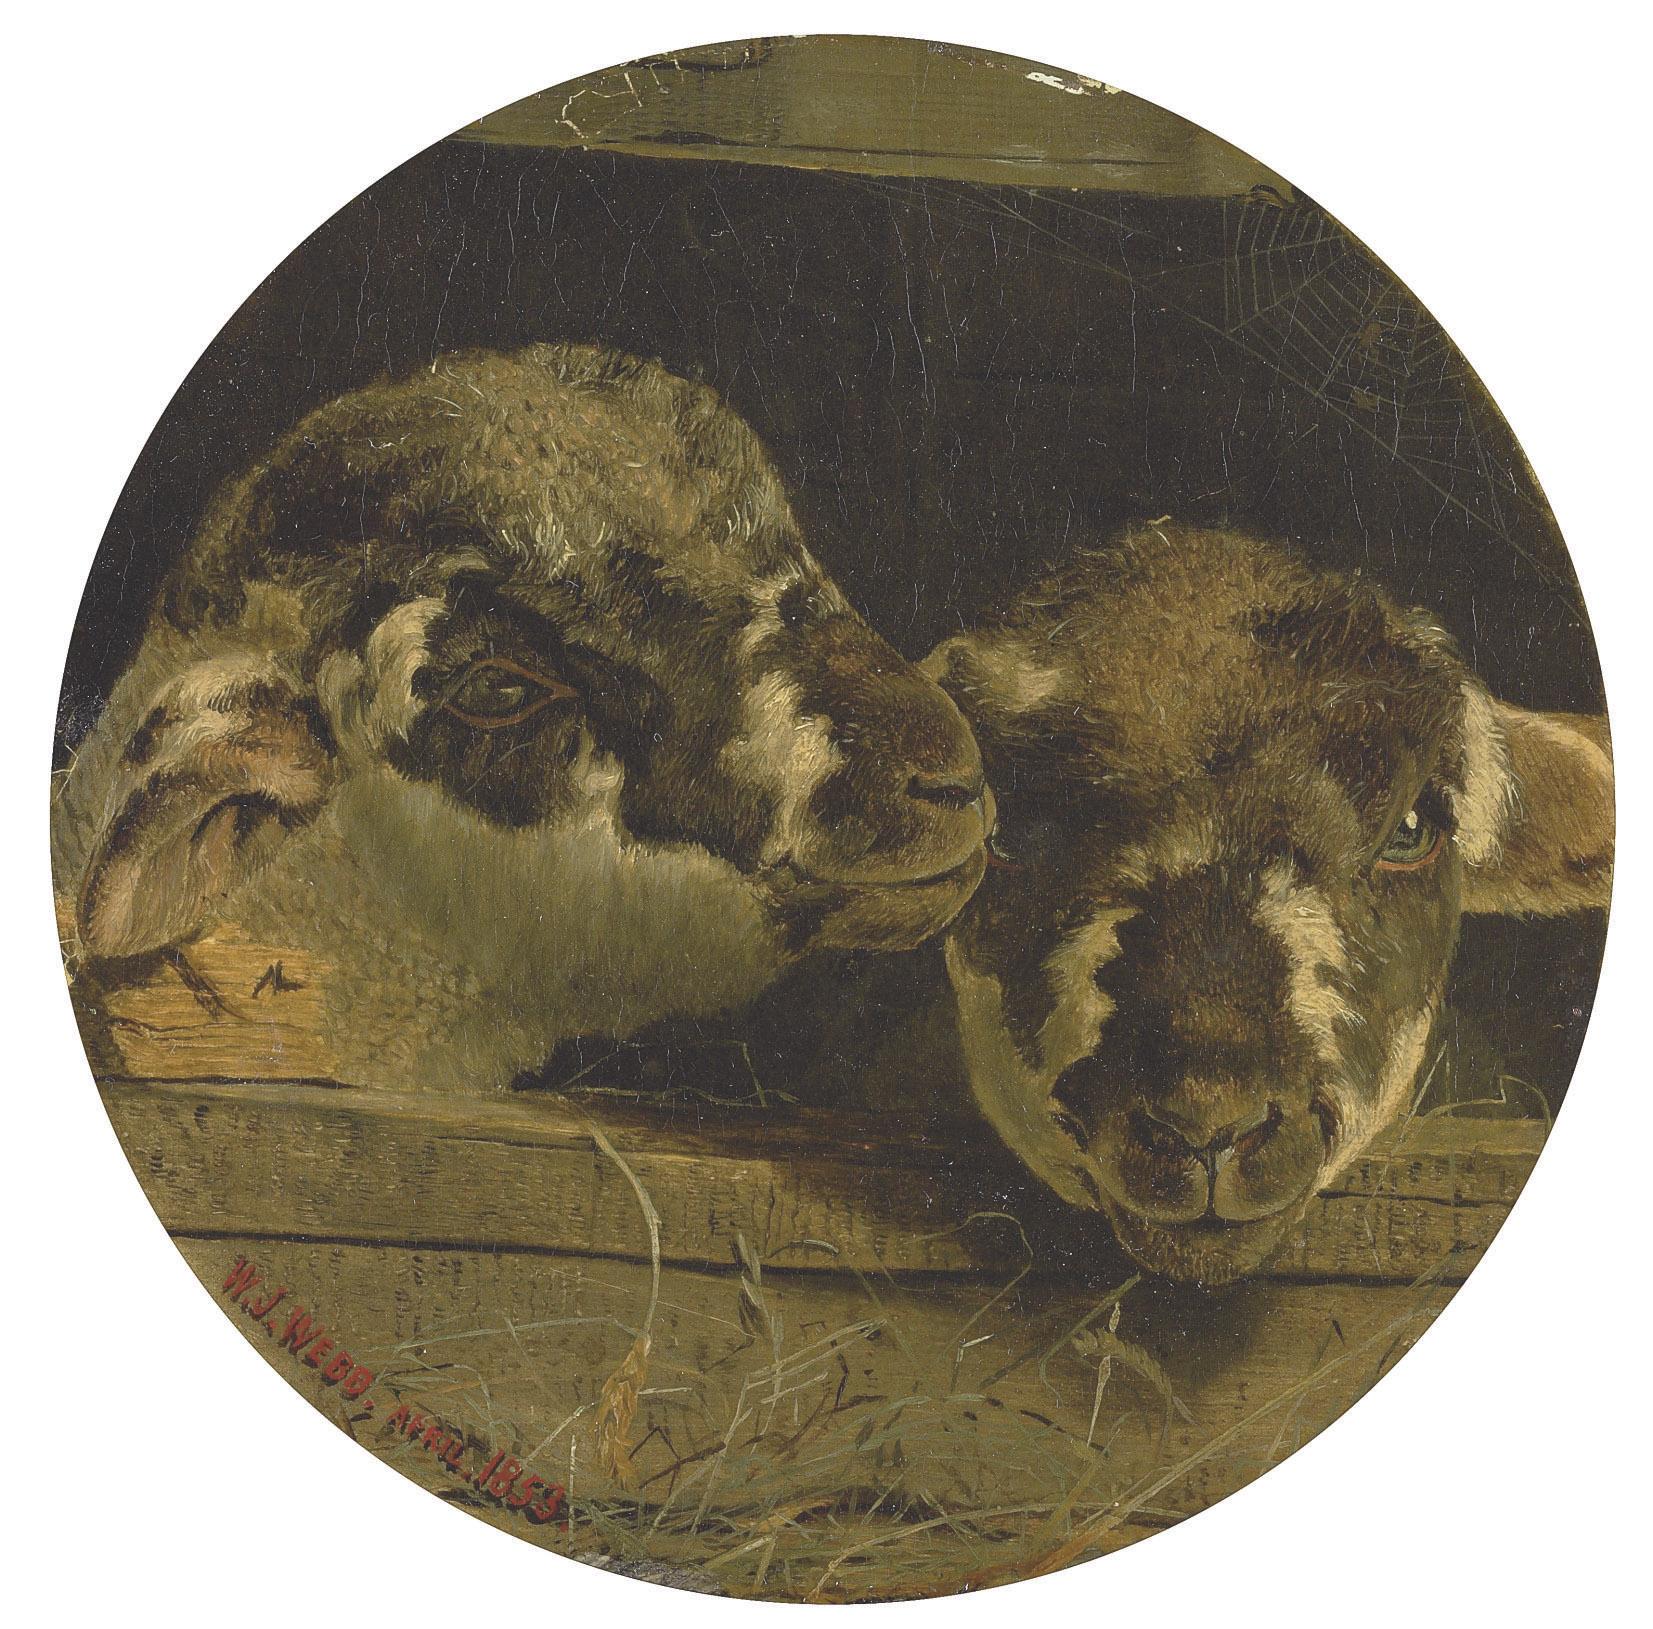 Two lambs in a barn